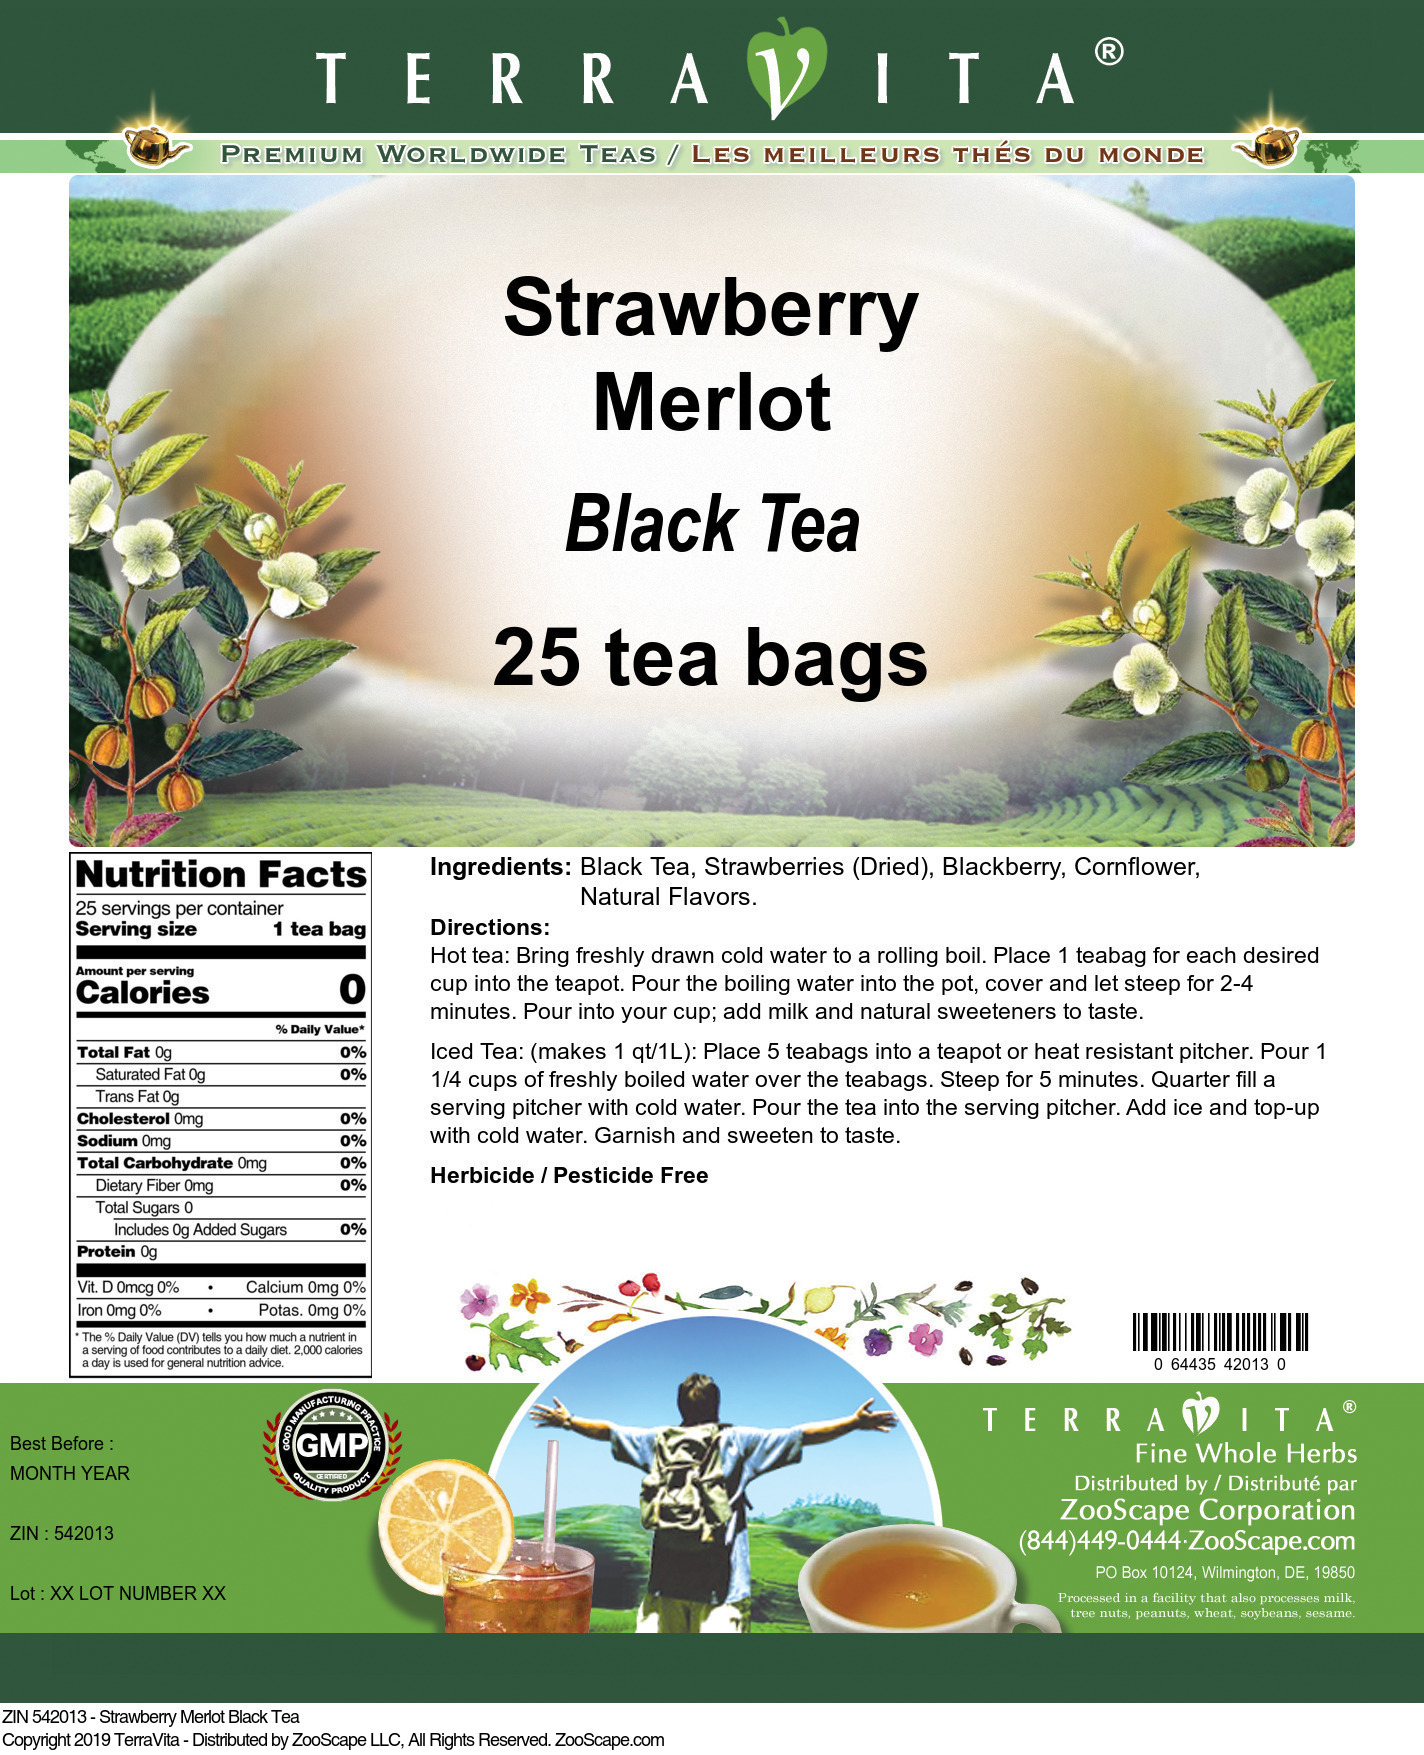 Strawberry Merlot Black Tea